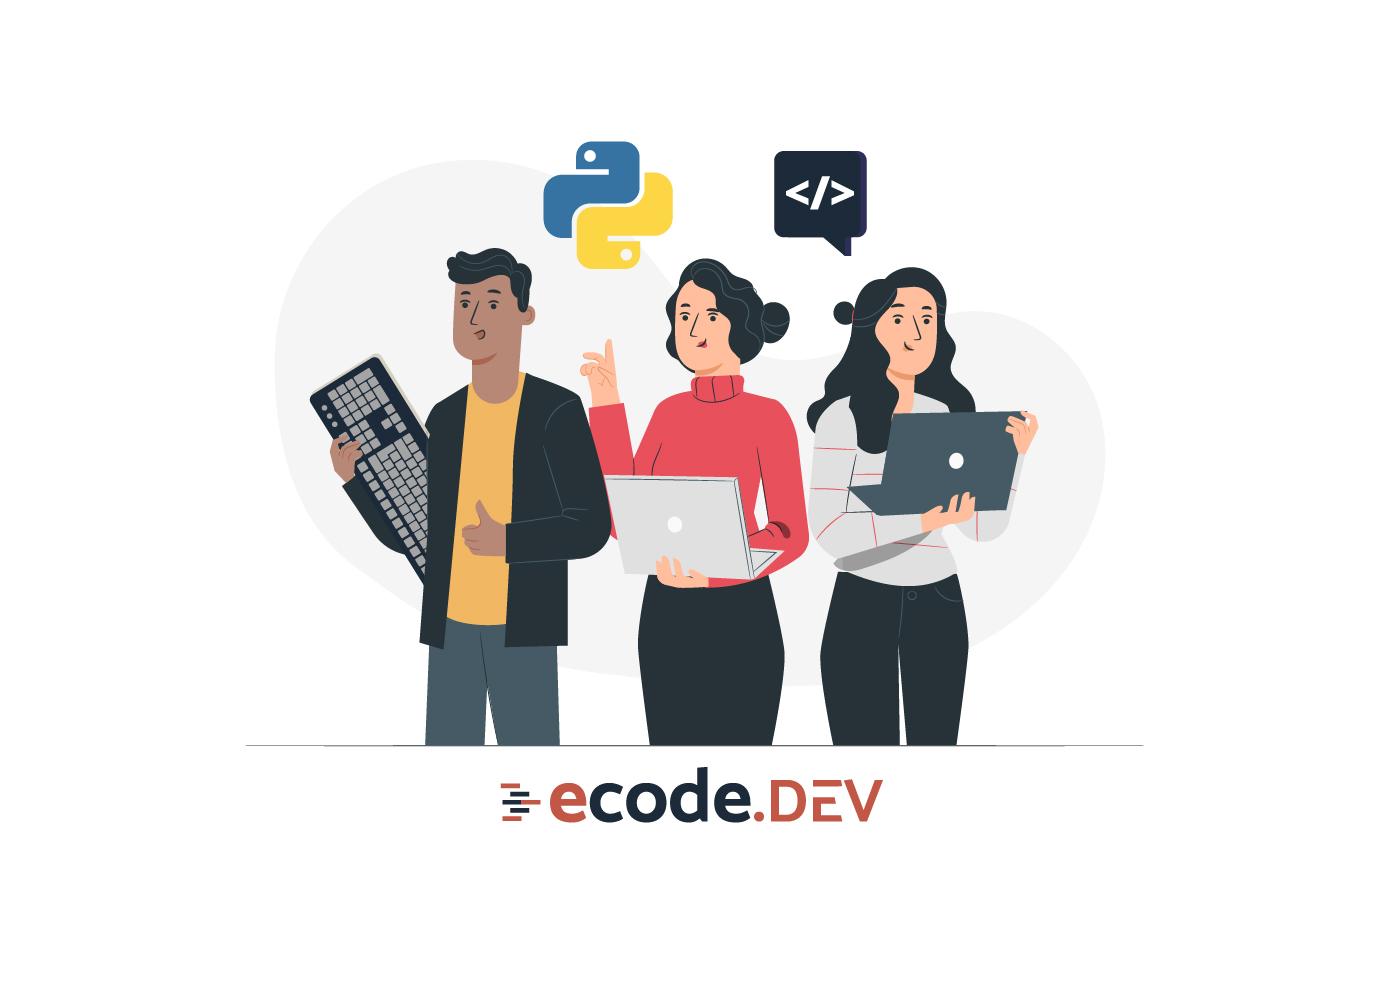 Curso Gratuito de Programación en Python 3 - Udemy (solo por 2 días)